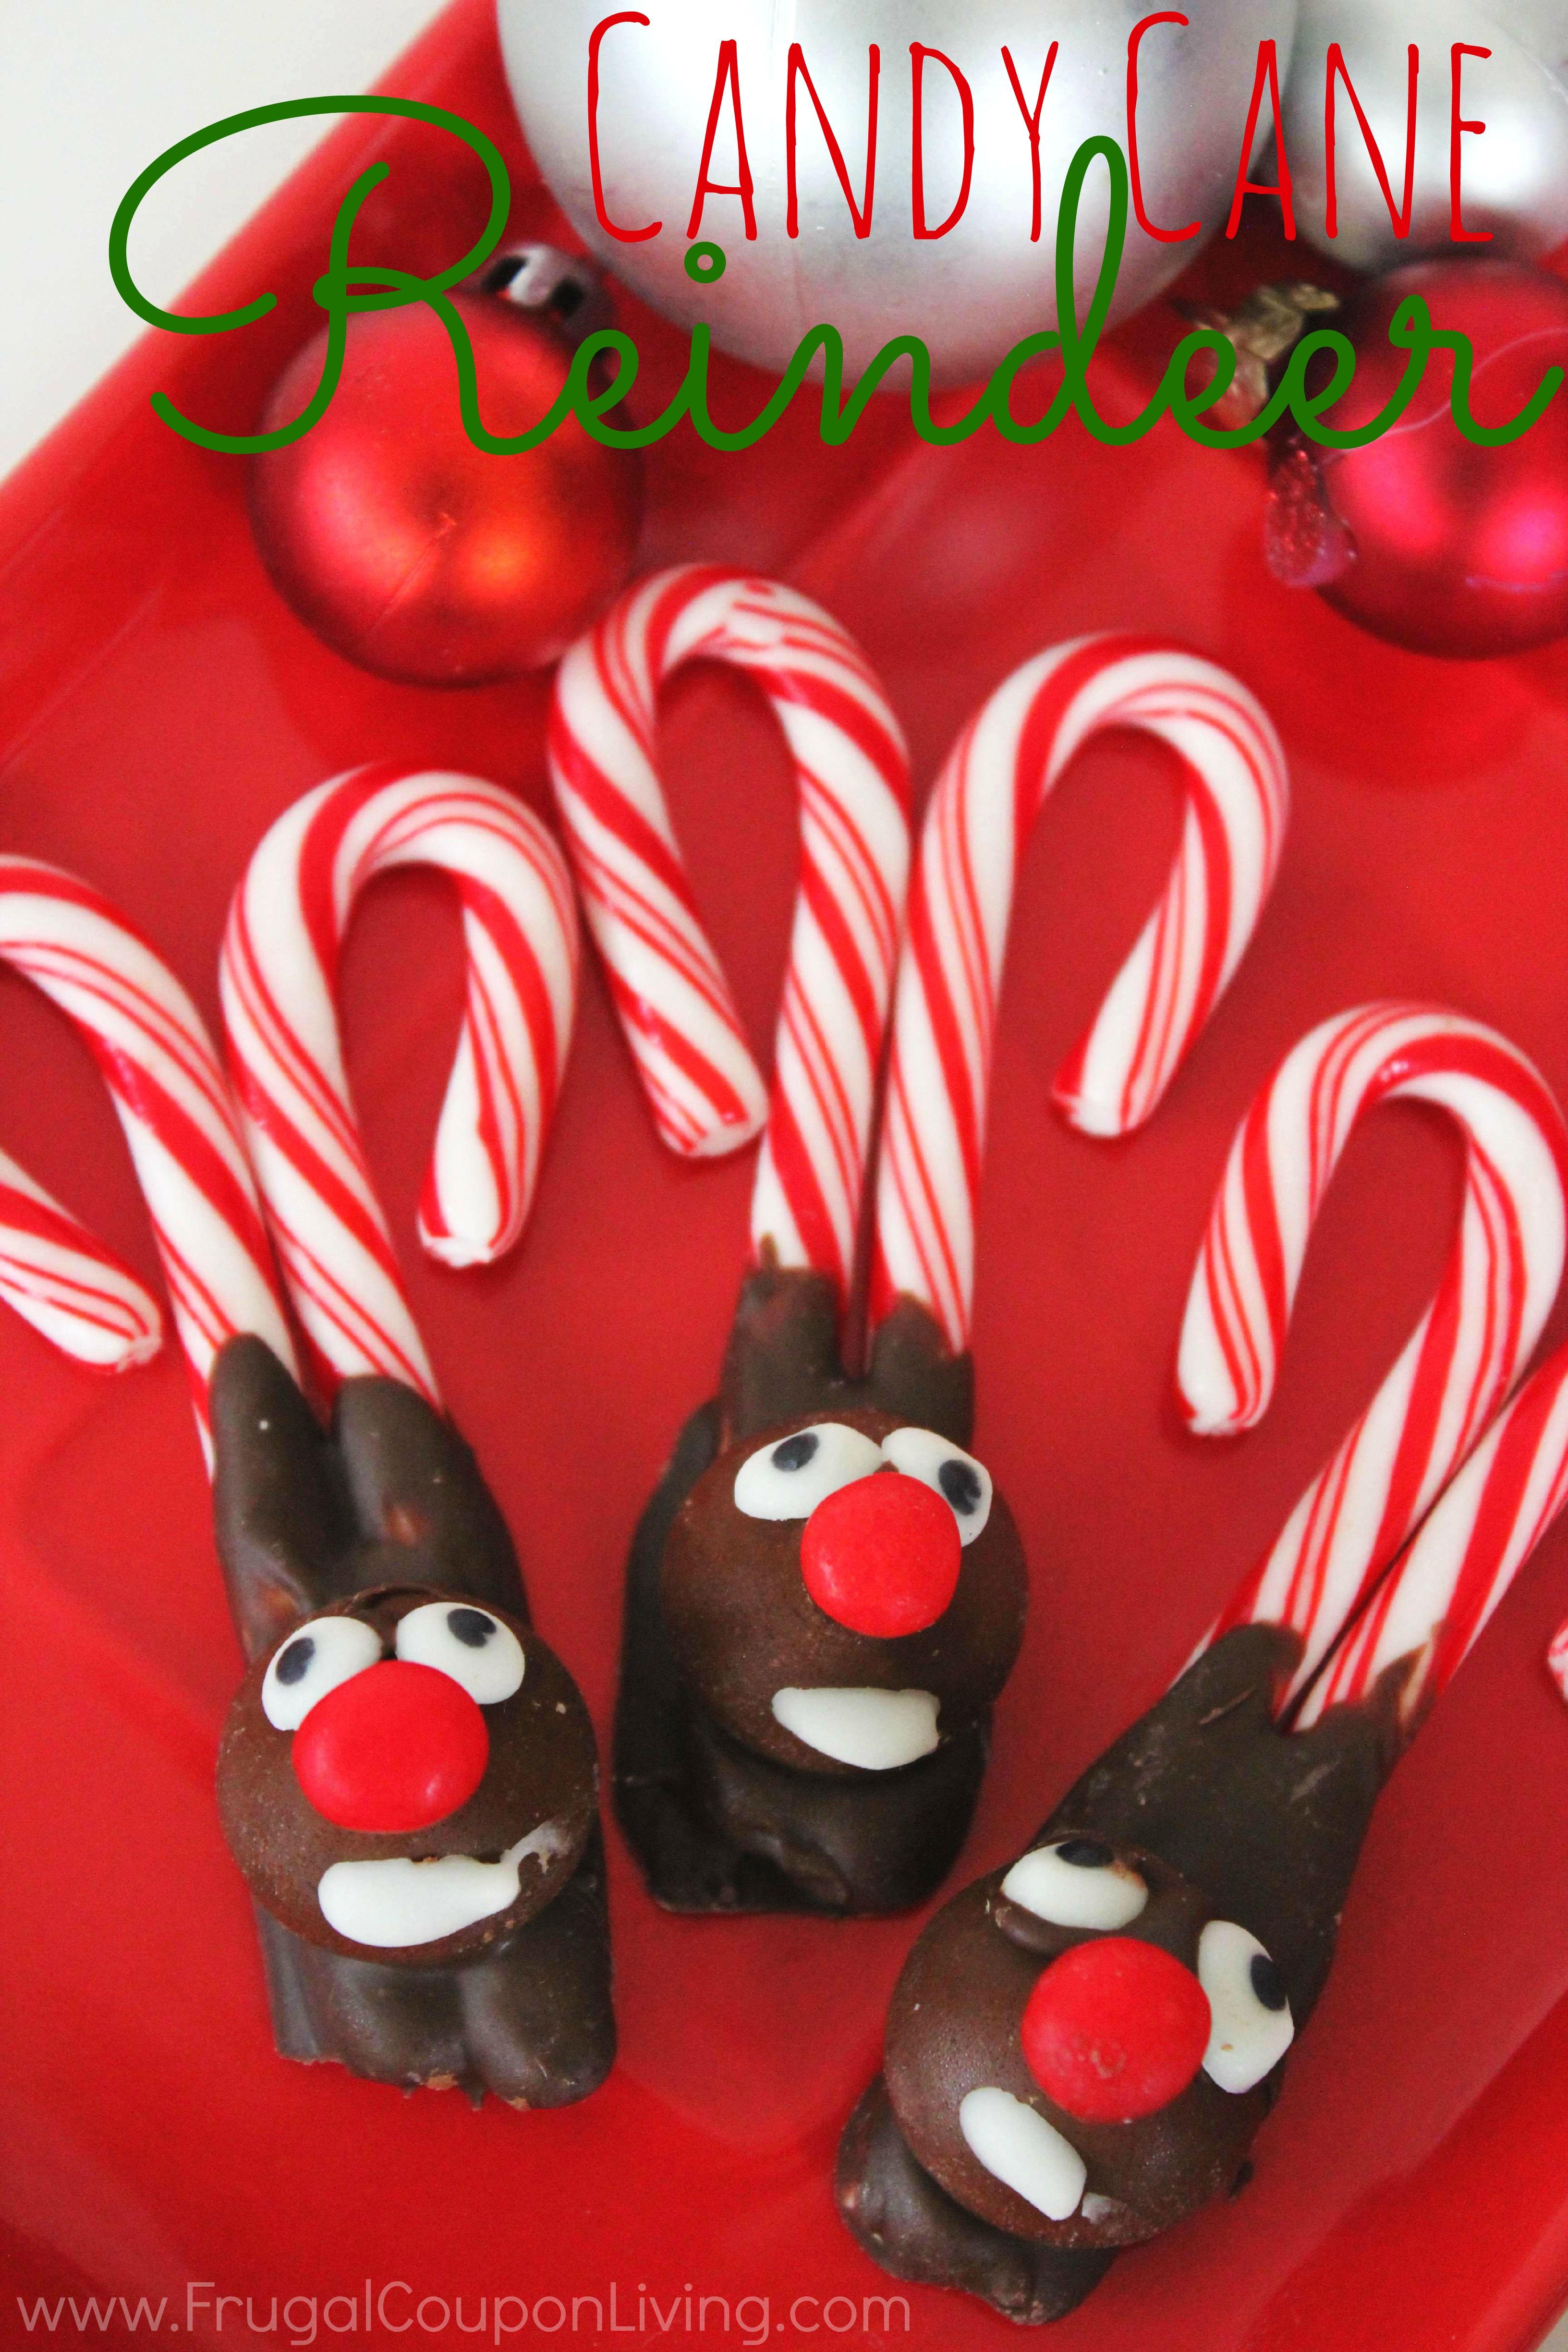 Candy Cane Reindeer – Kids Christmas Food Craft